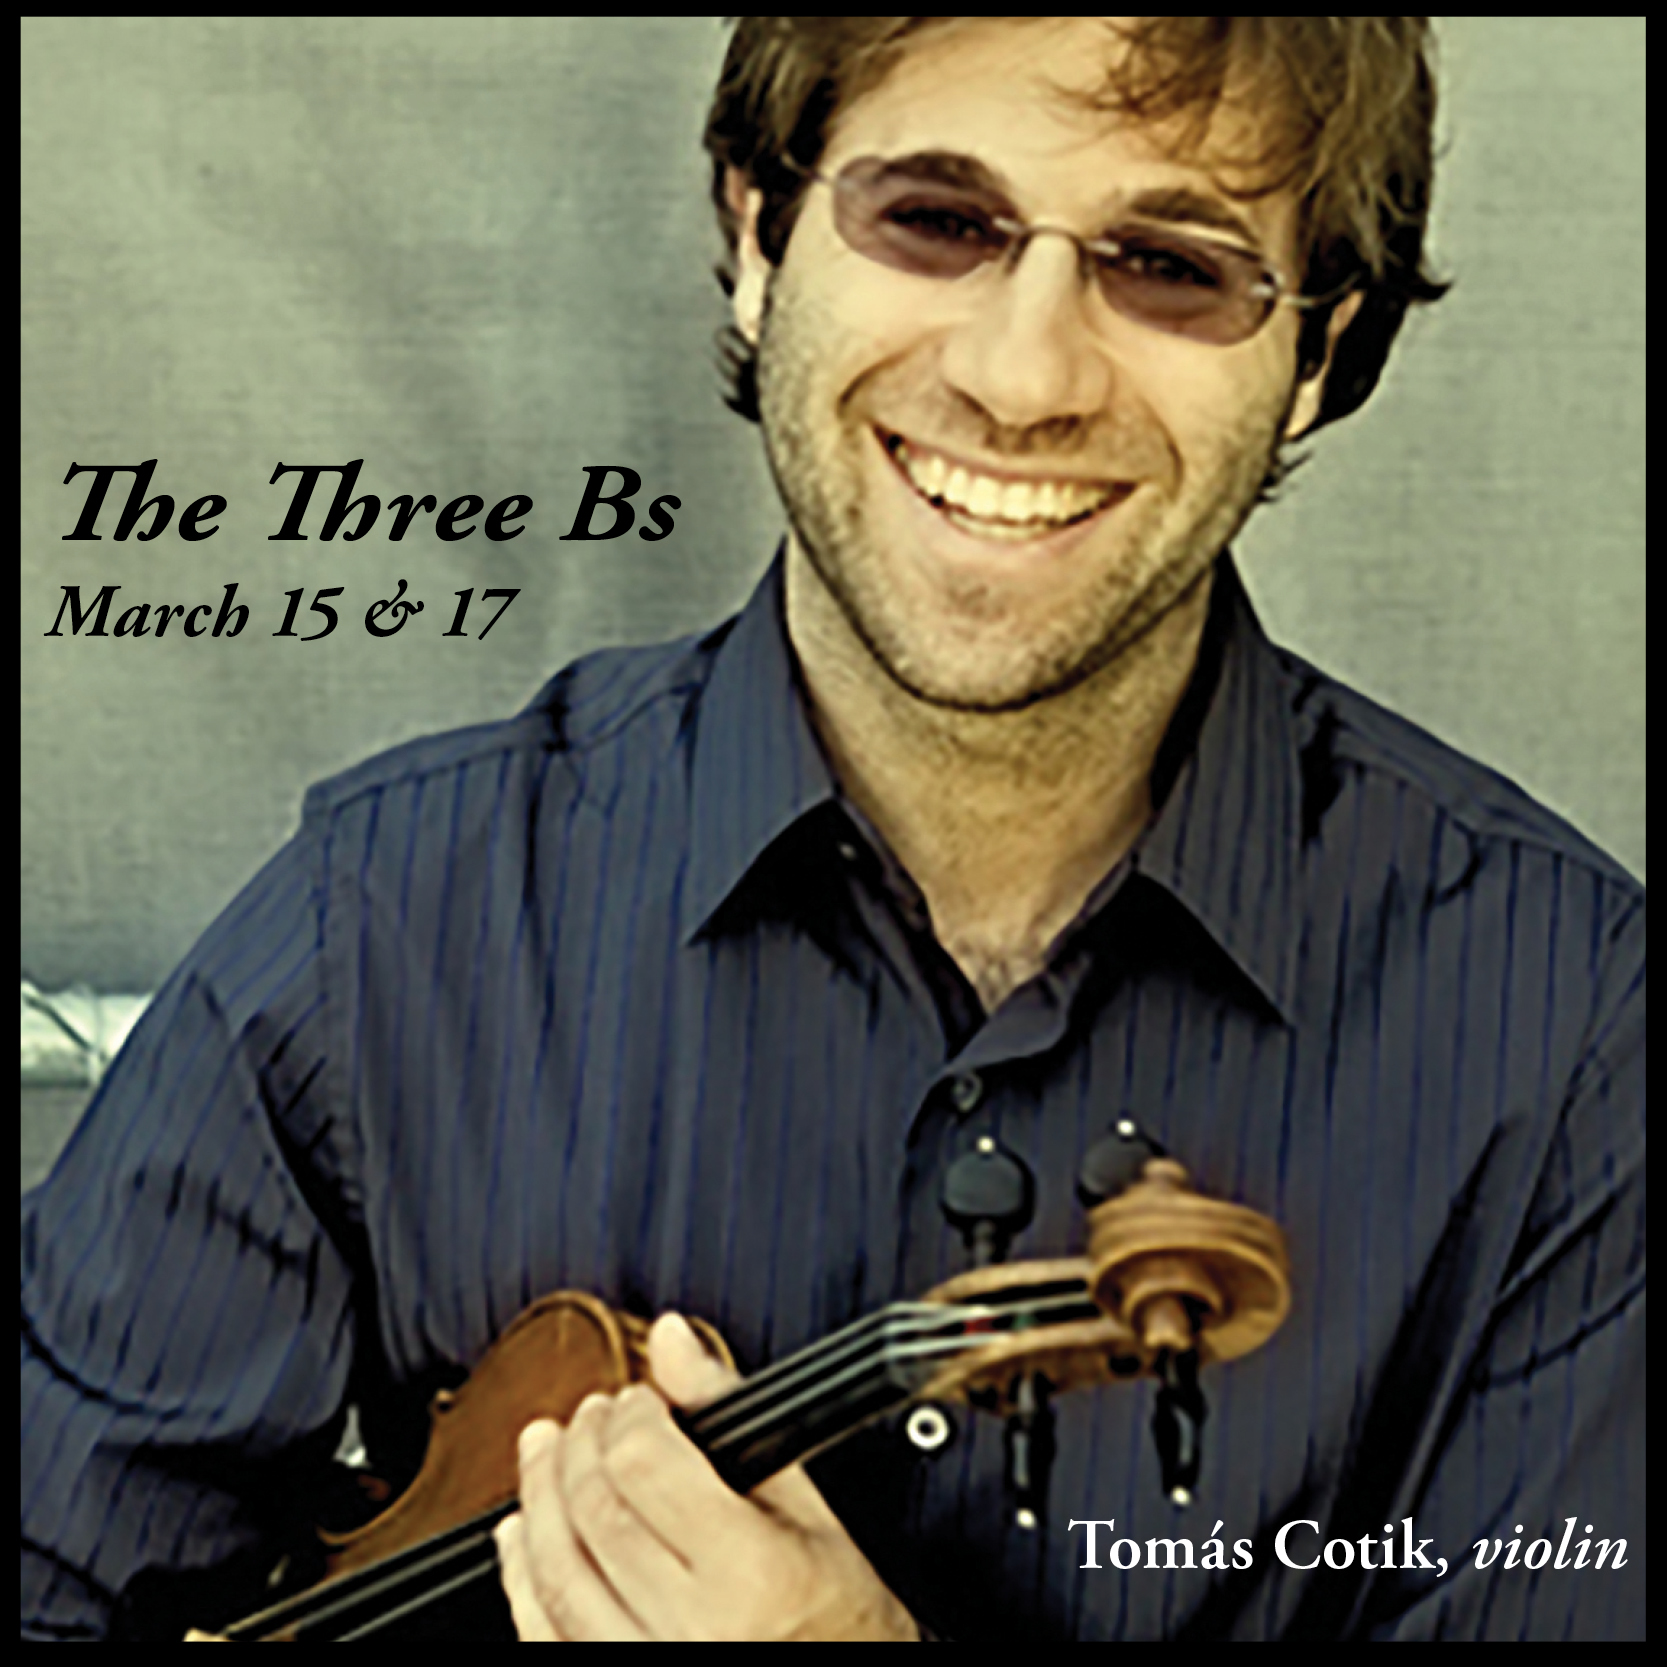 March  2019 Tomas Cotik image for web-concert title.jpg